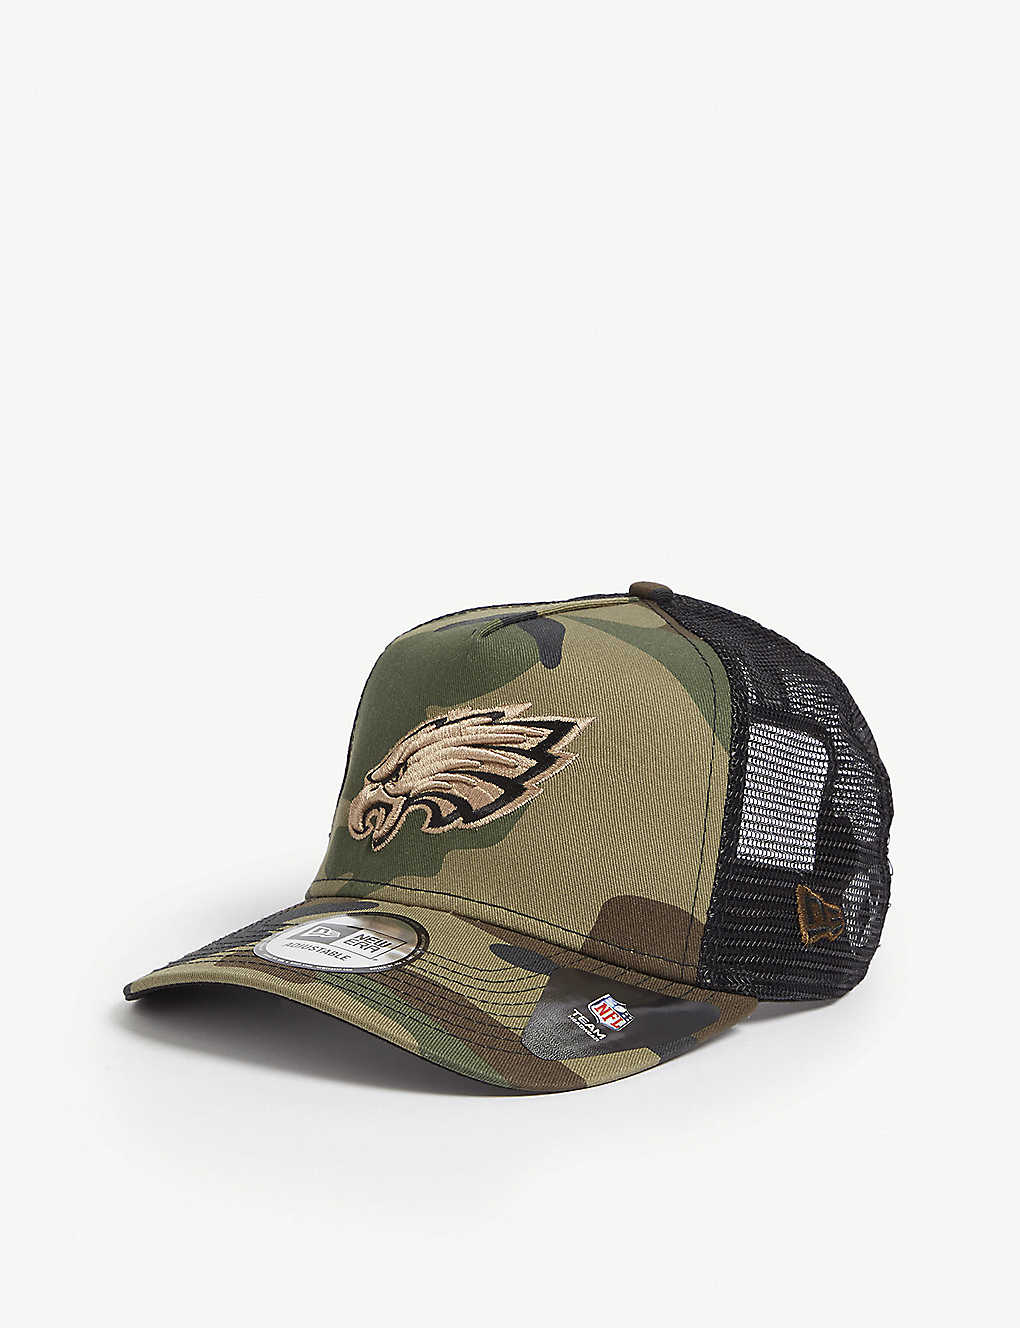 90934f03f1a NEW ERA - Philadelphia Eagles camouflage mesh snapback cap ...